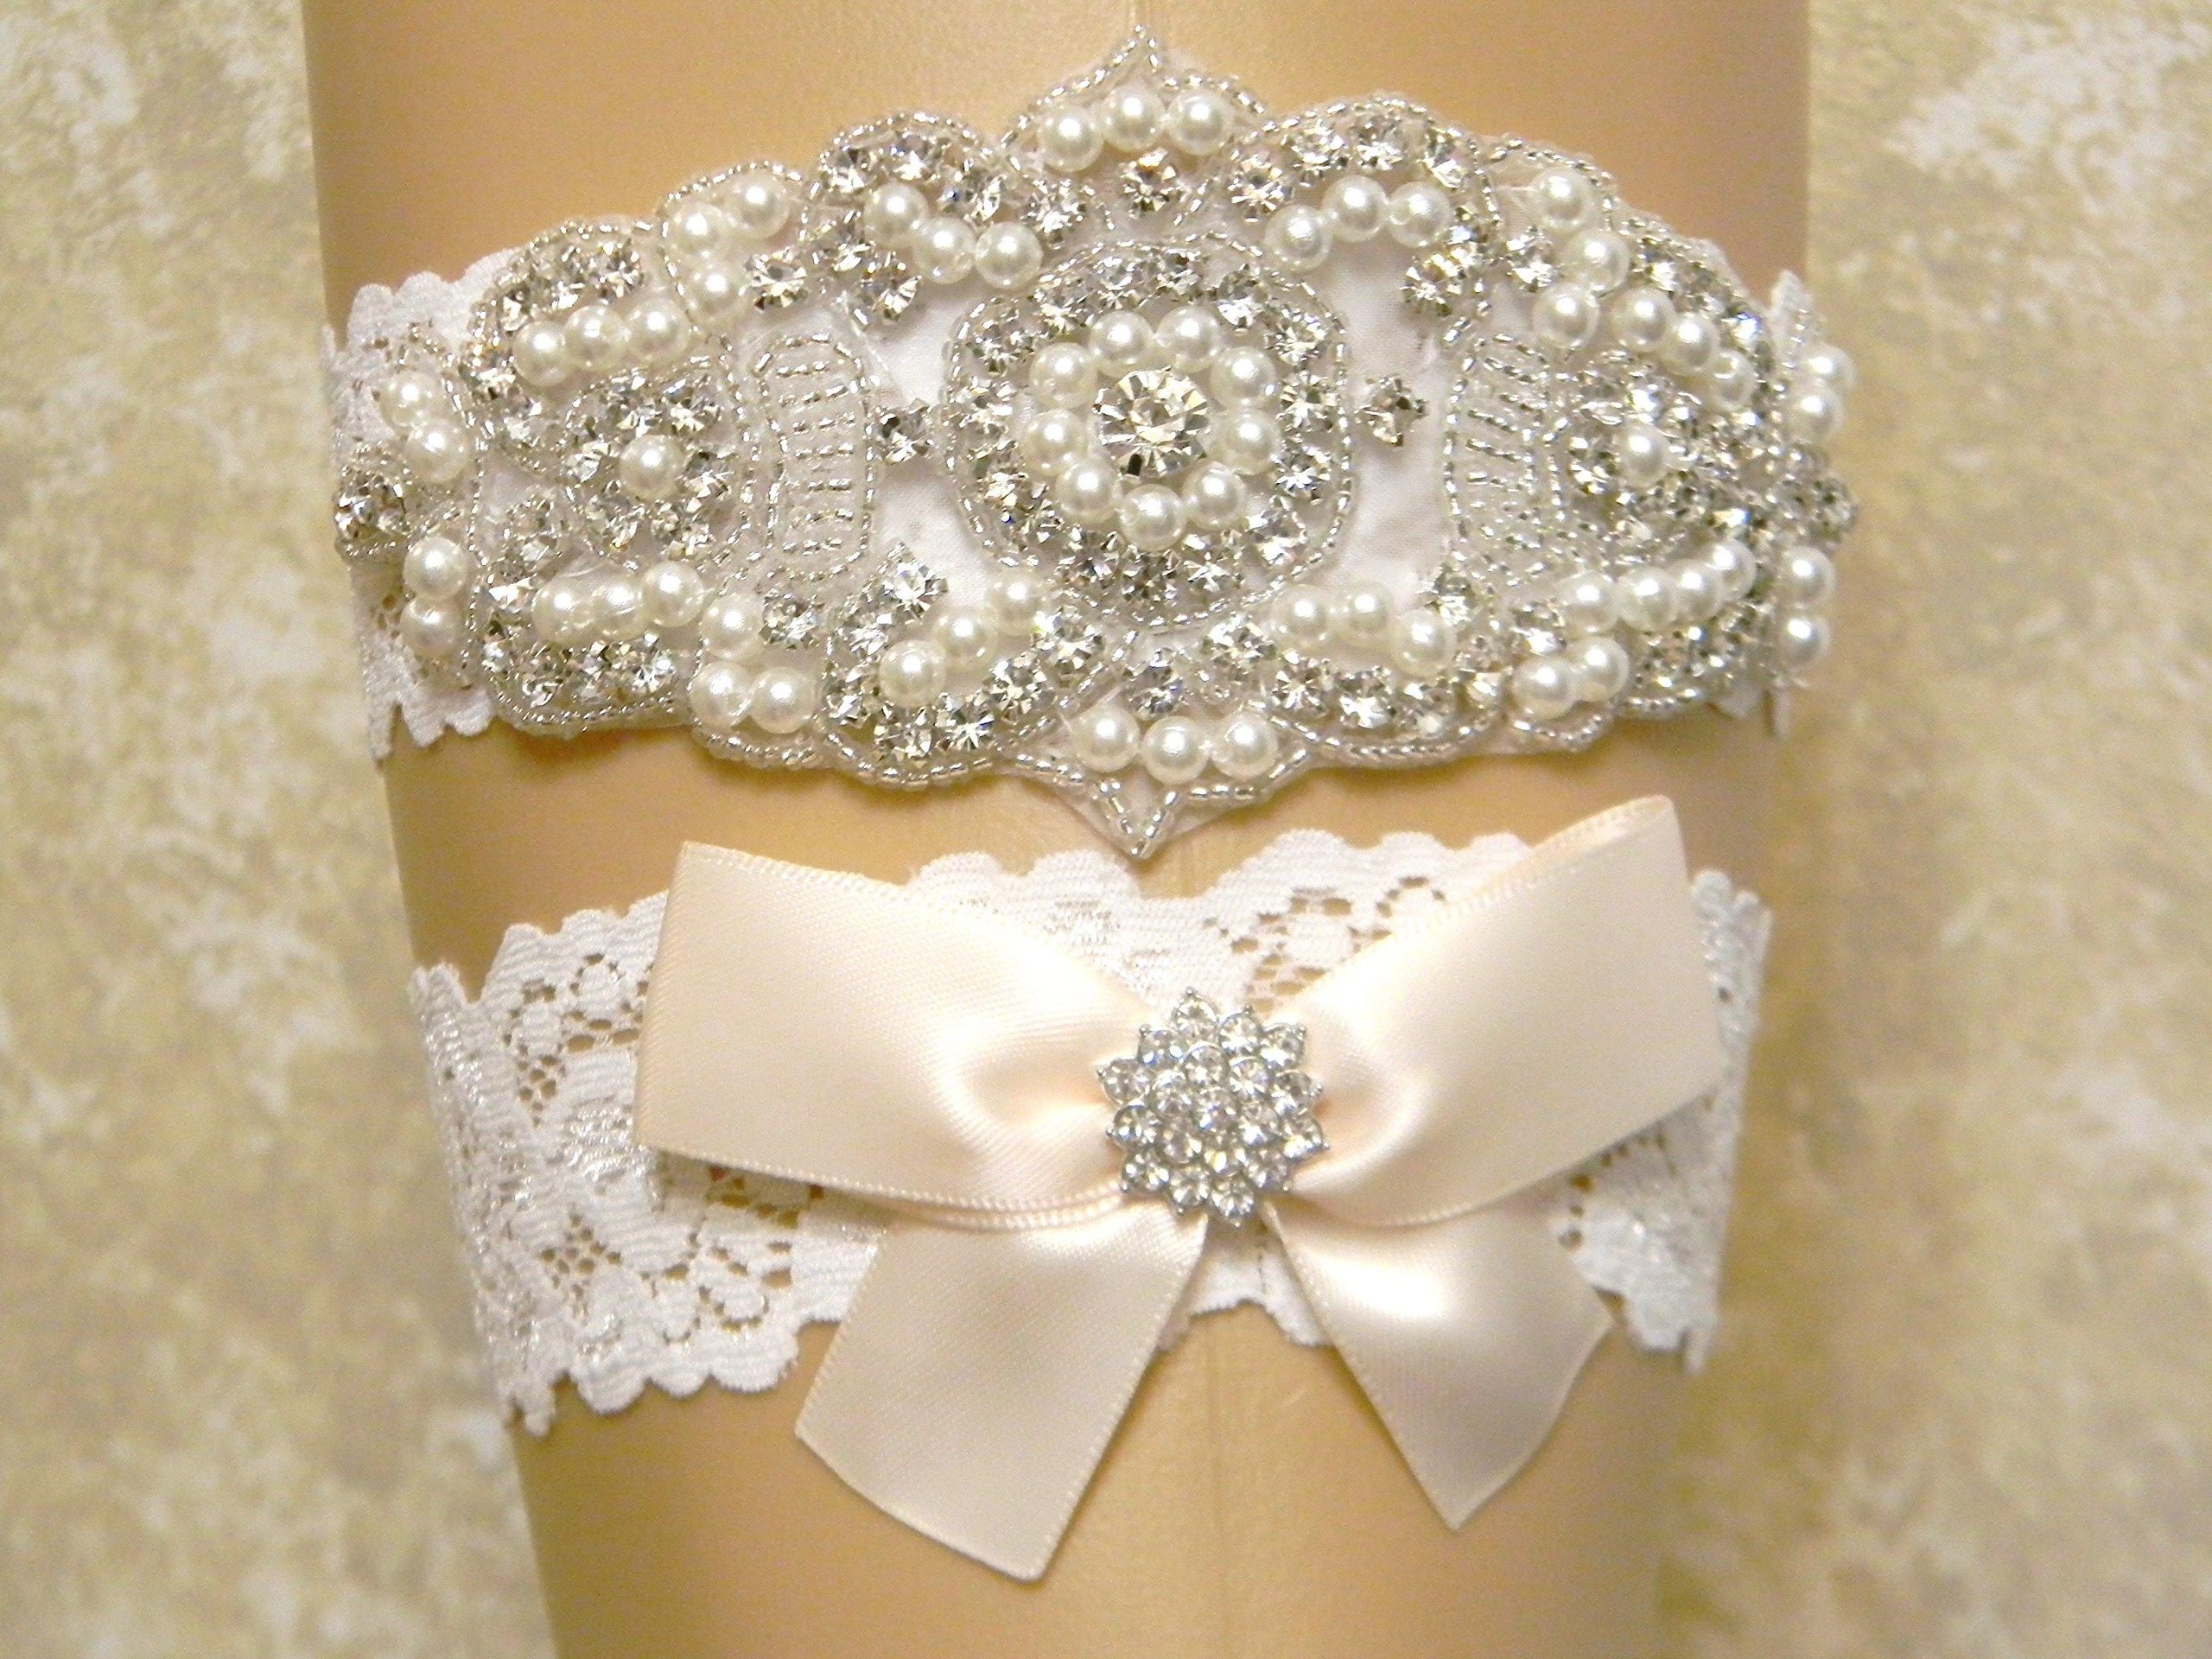 Light Champagne Wedding Garter Set, Bridal Garter Belt, Pearl and Crystal Rhinestone Keepsake and Toss Garter Set, Lace Garters, MORE COLORS by PCB Studio